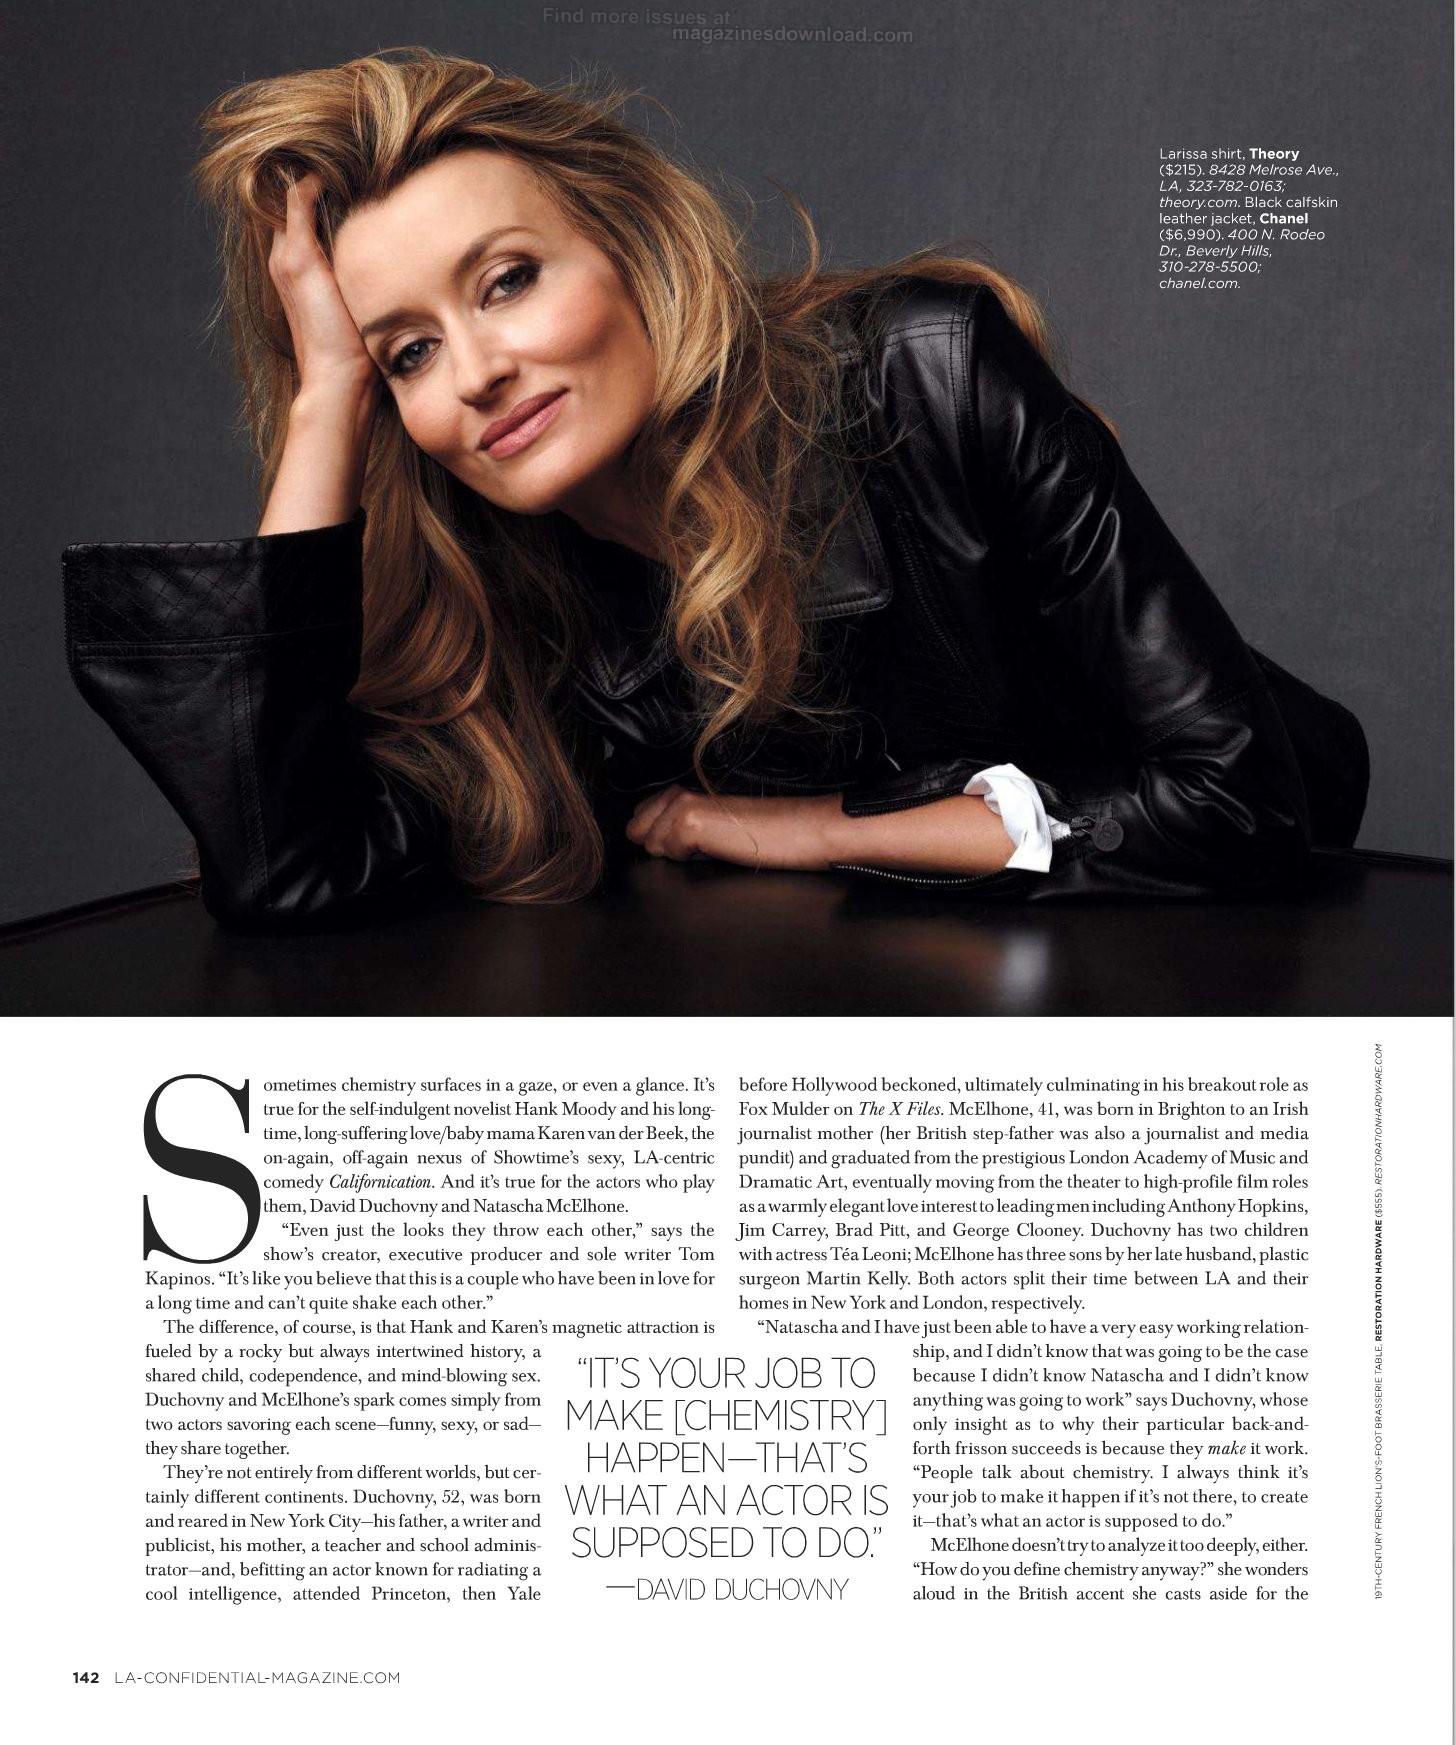 Natascha McElhone Los Angeles Confidential Magazine